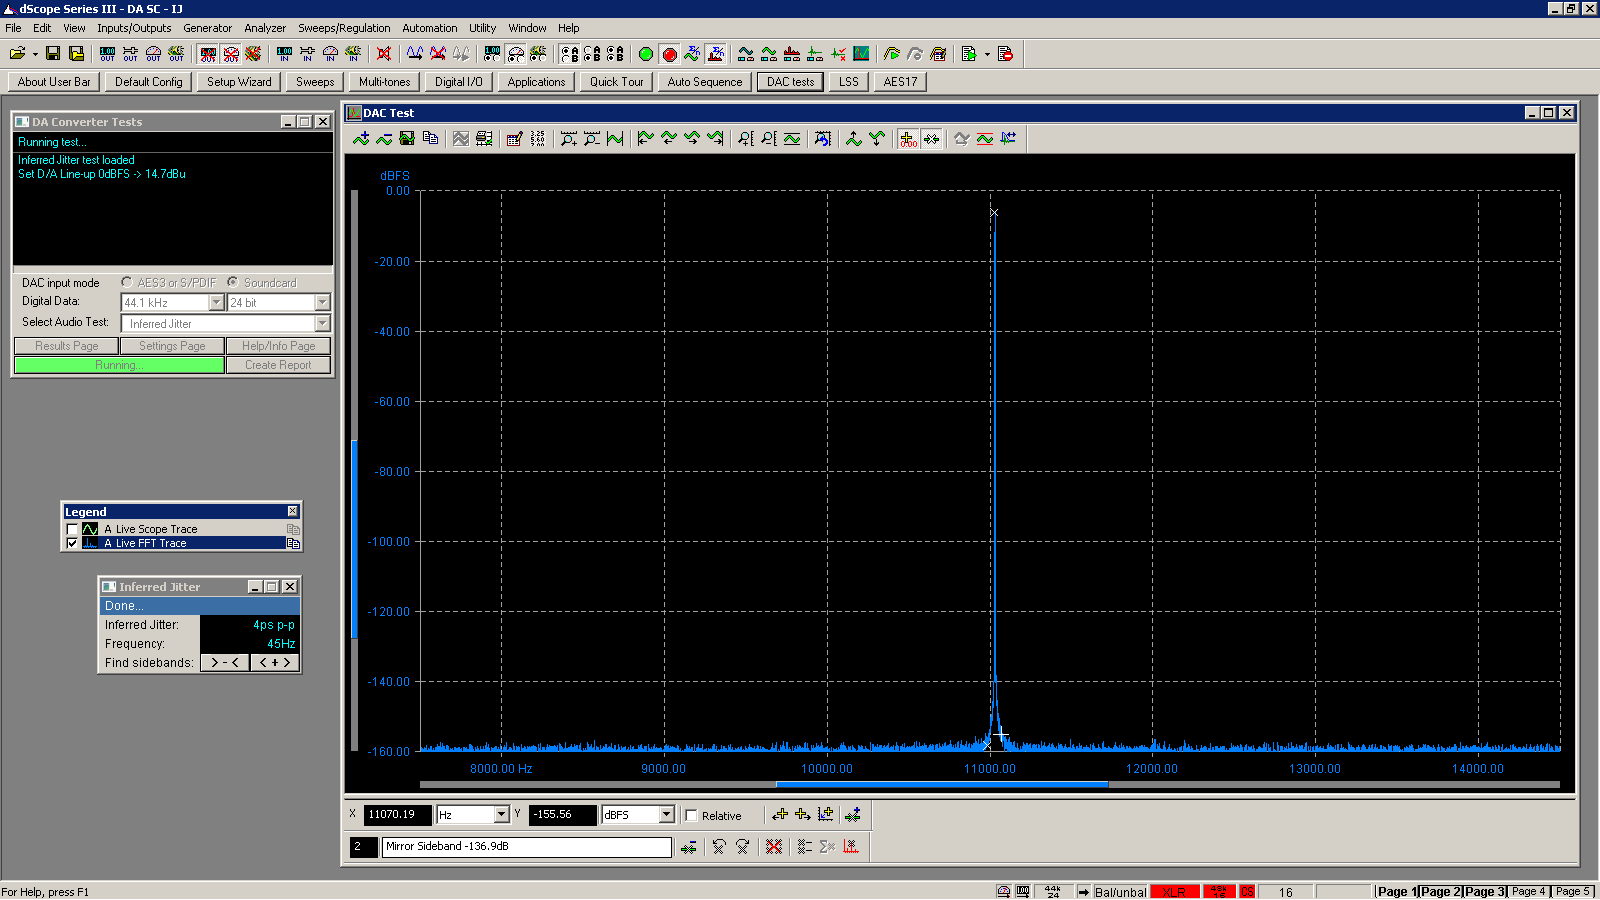 20150925 Gungnir MB inferred jitter.PNG